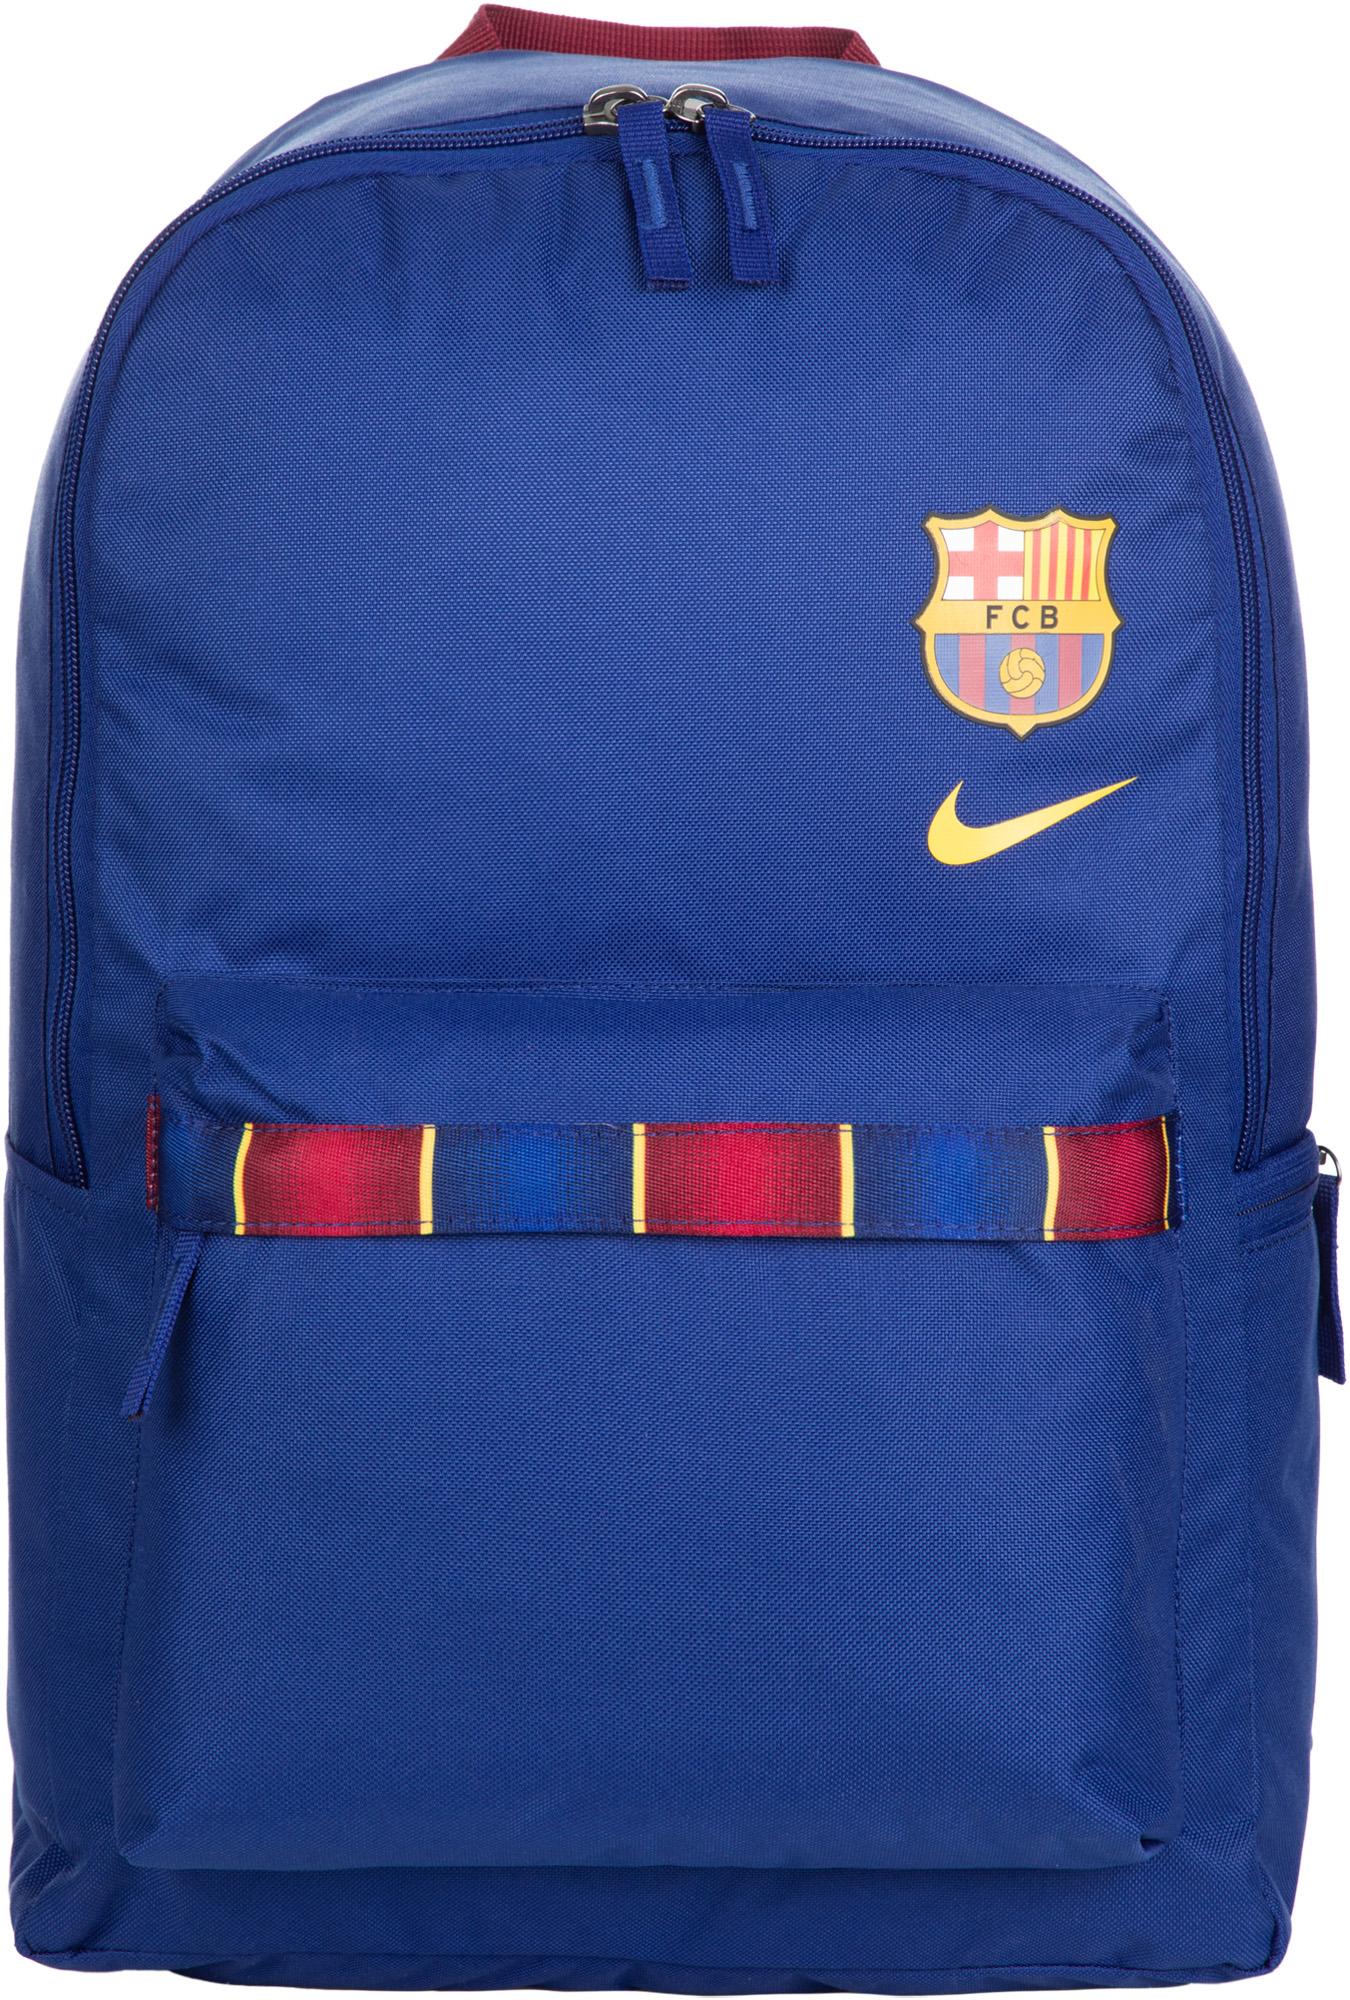 Nike Рюкзак мужской Nike FC Barcelona Stadium недорого